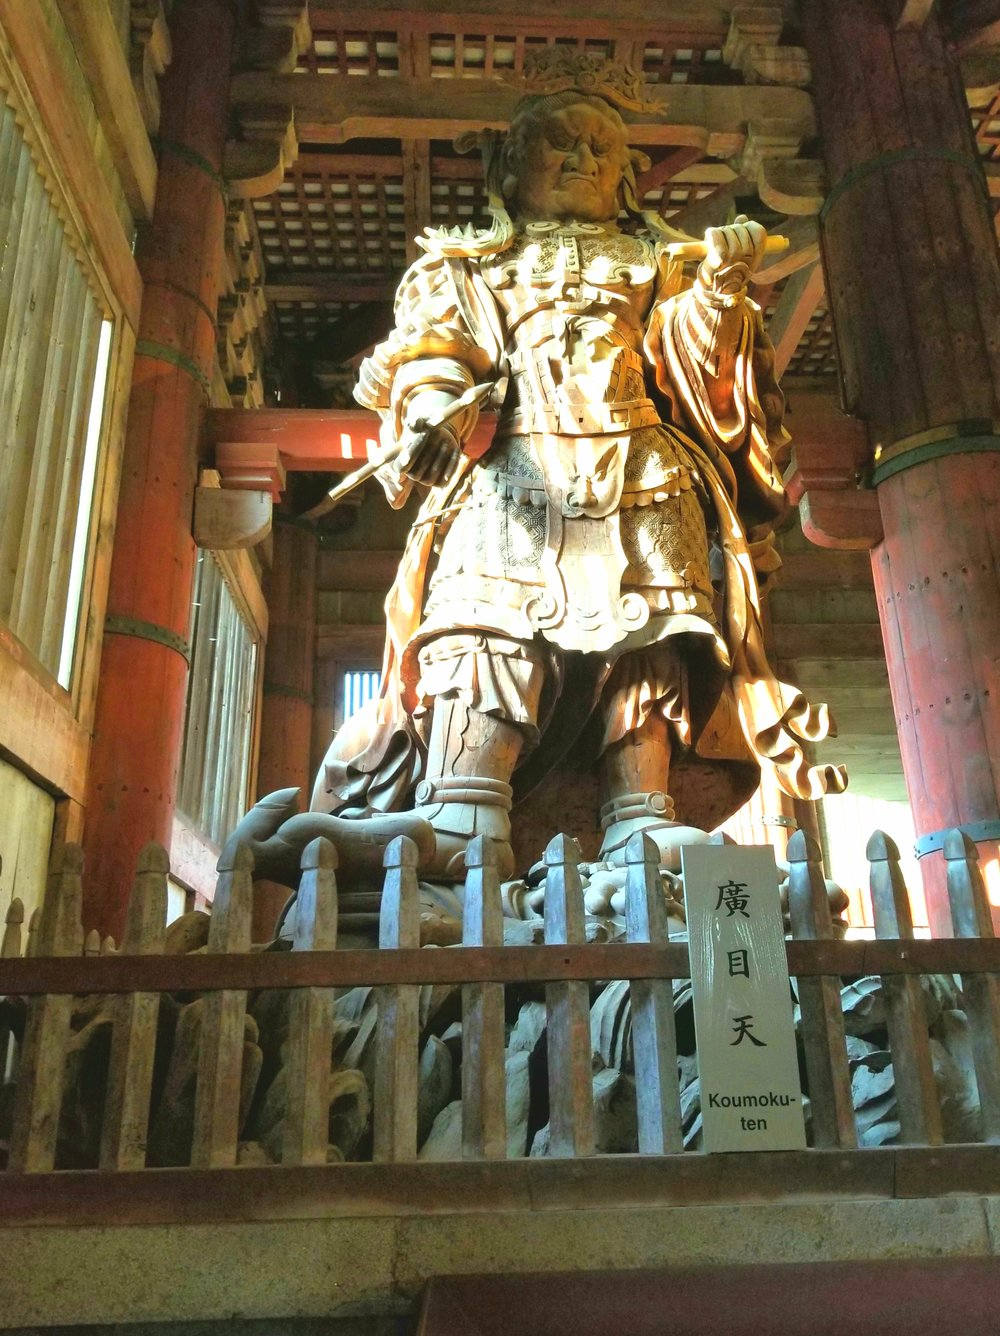 uprooted-traveler-todai-ji-temple-nara-park-kyoto-81.jpg